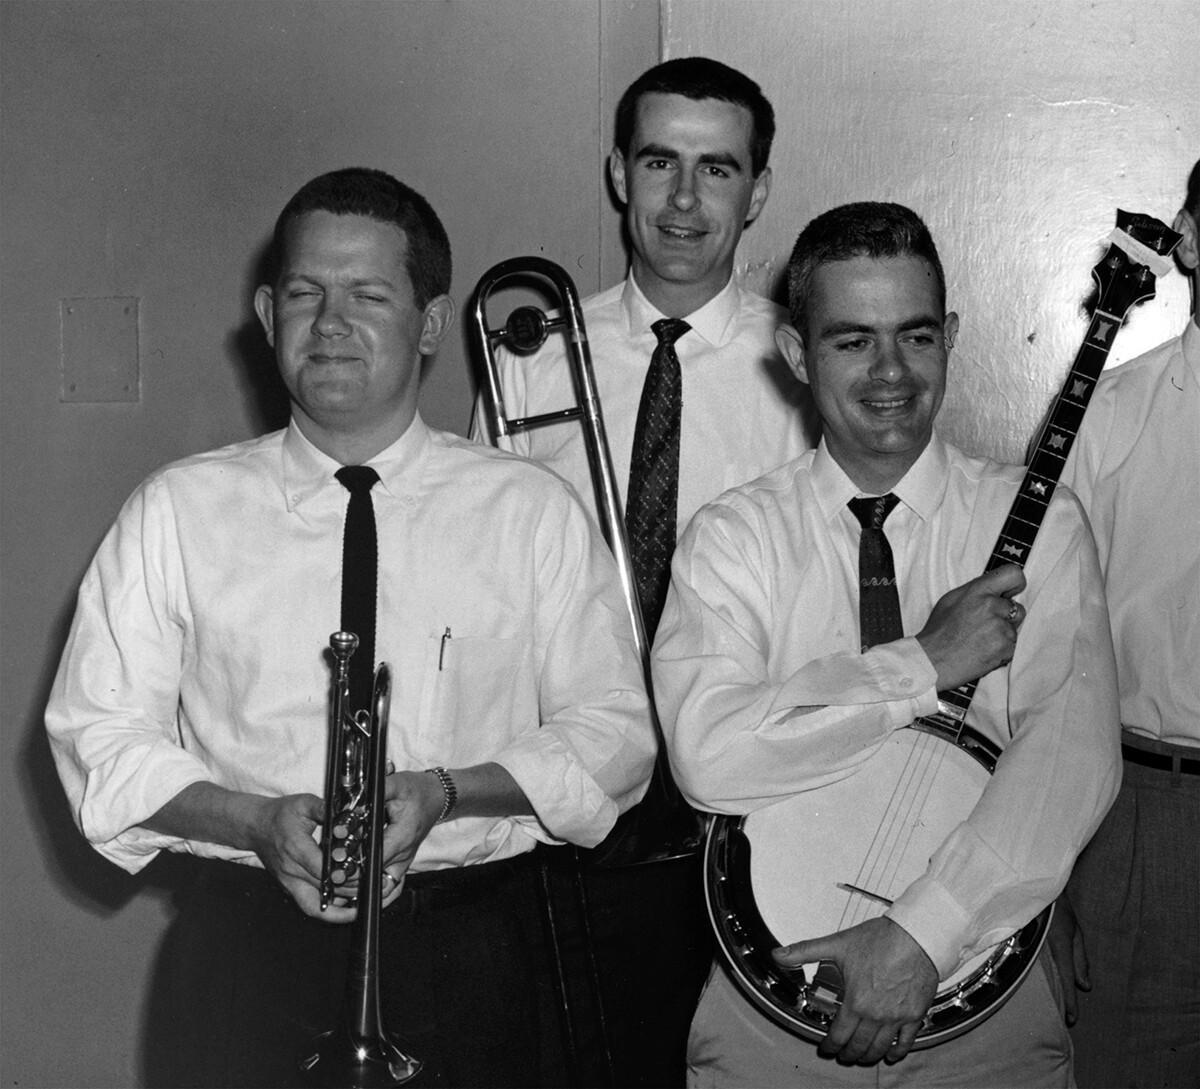 Jim Leigh (center) with Ev Farey (L) and Lee Valencia (R)